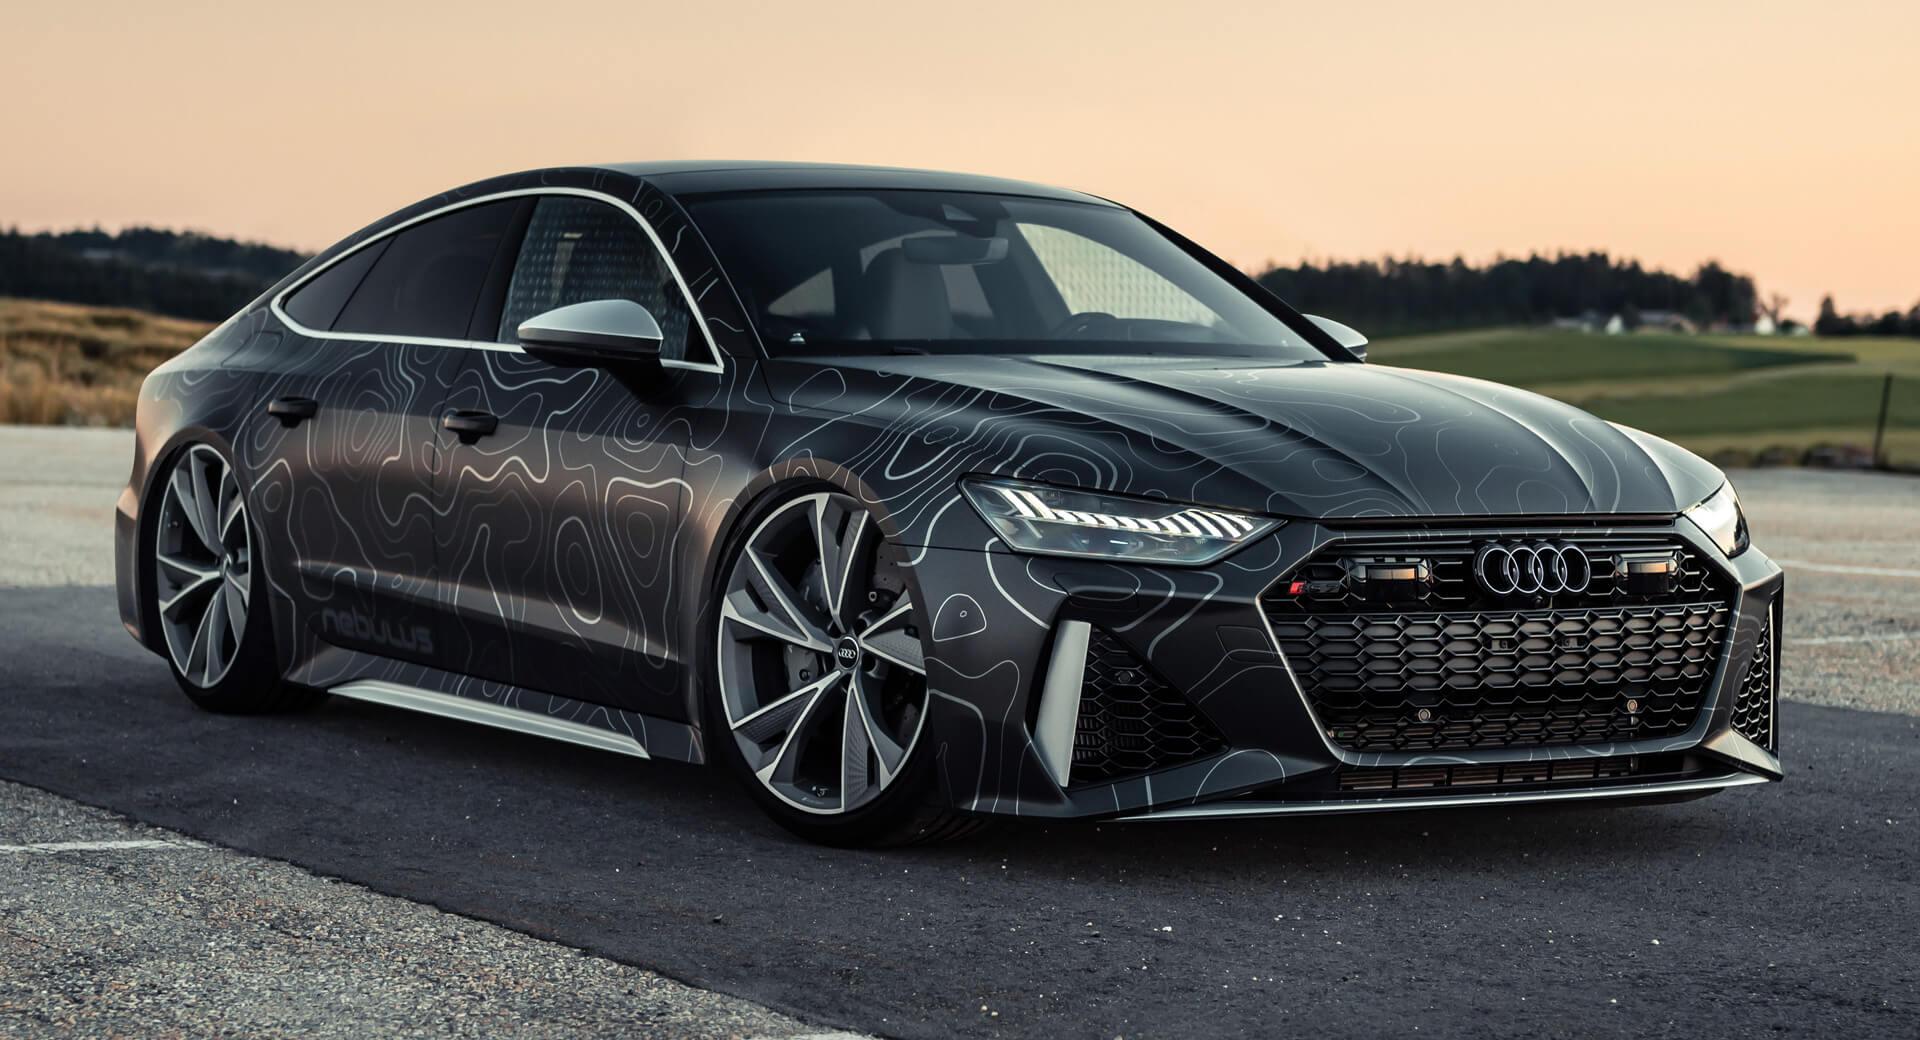 Kekurangan Audi Rs7 Perbandingan Harga